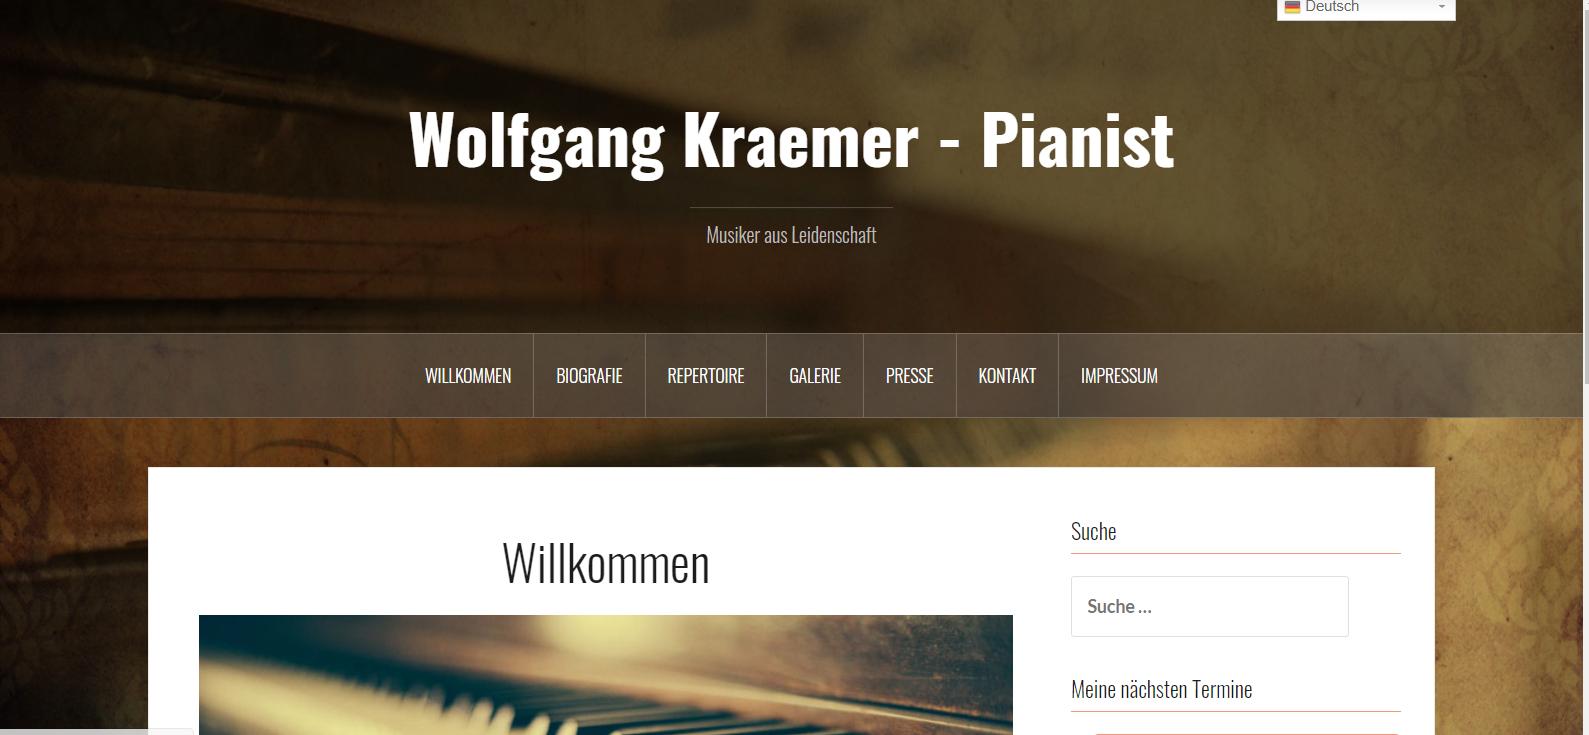 Pianist Wolgang Kraemer